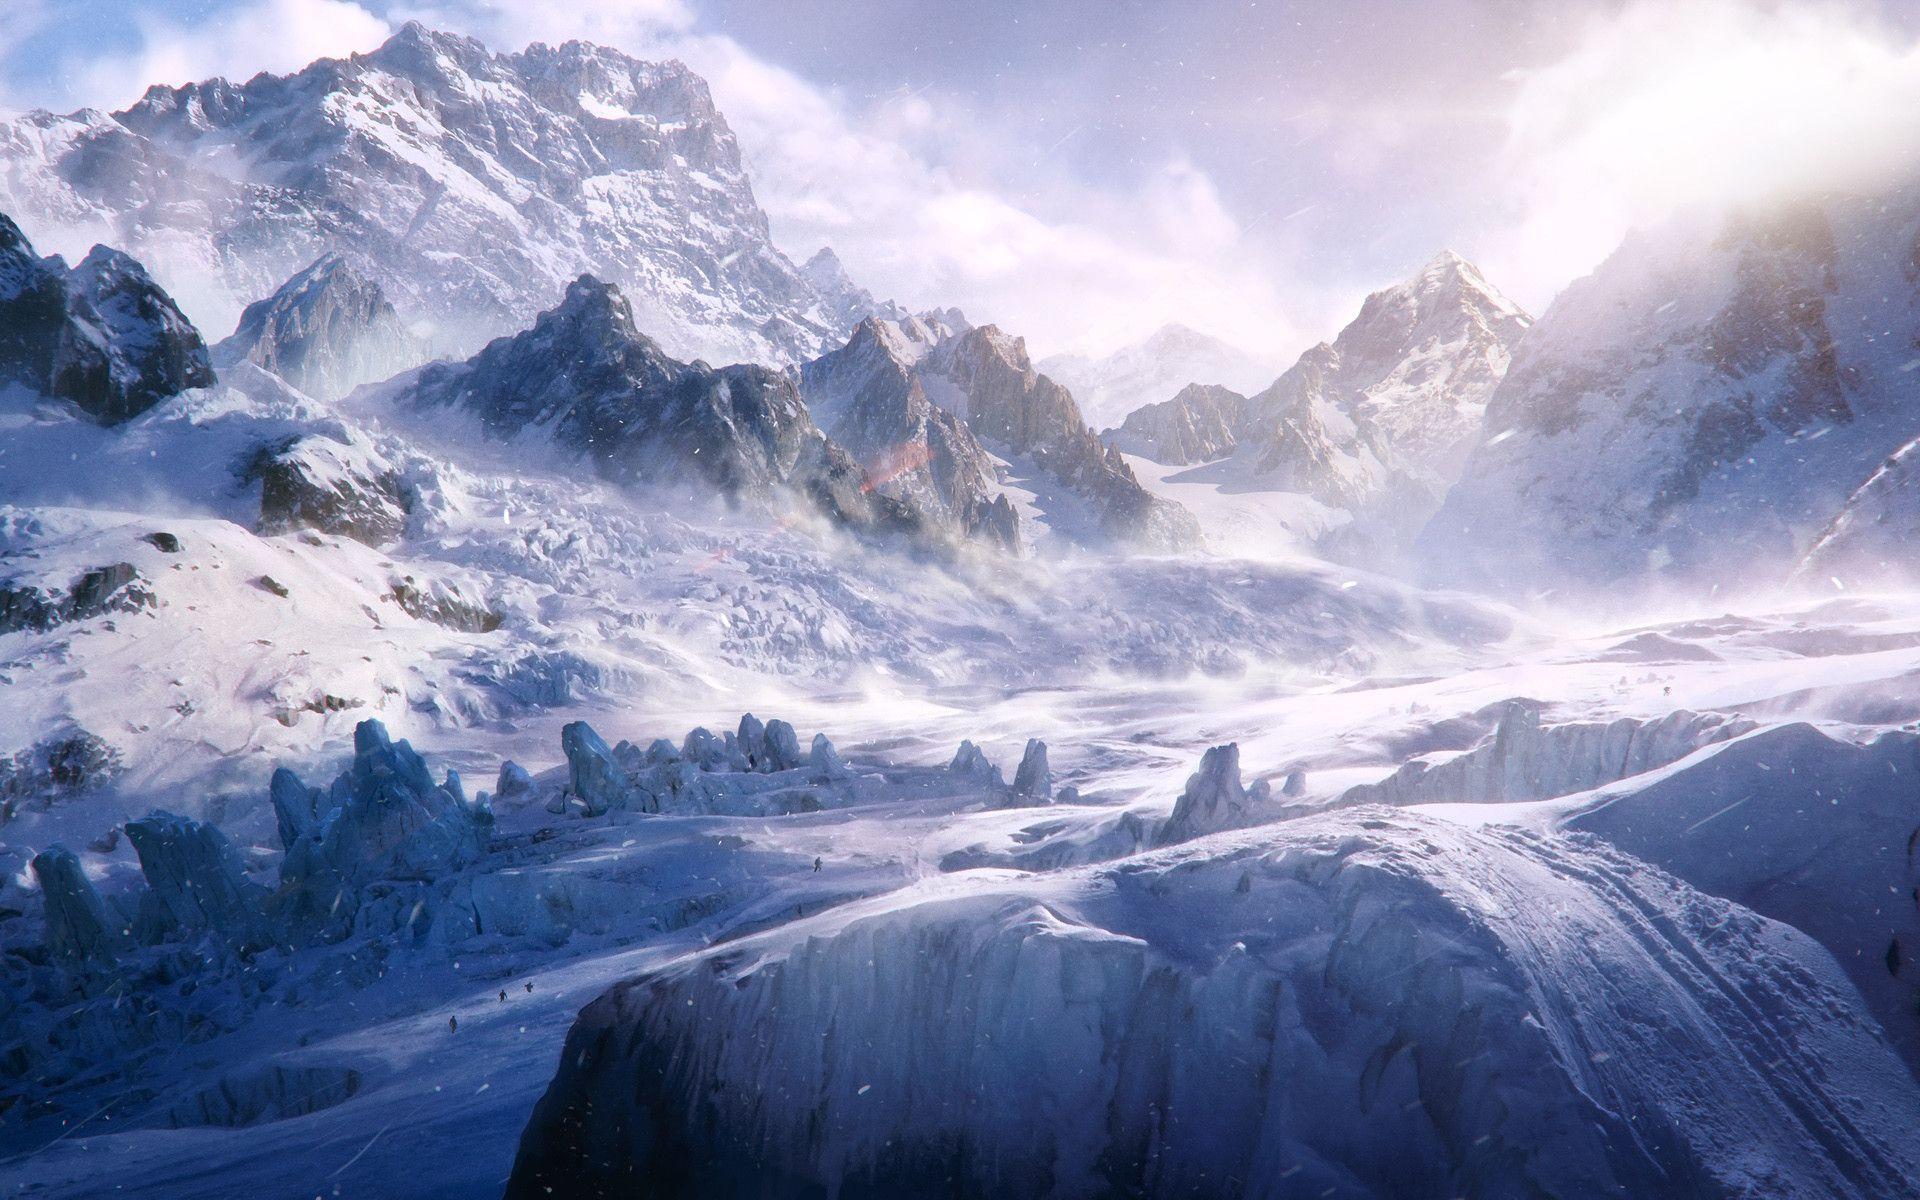 Frozen Tundra 1920 X 1200 Hd Landscape Beautiful Landscape